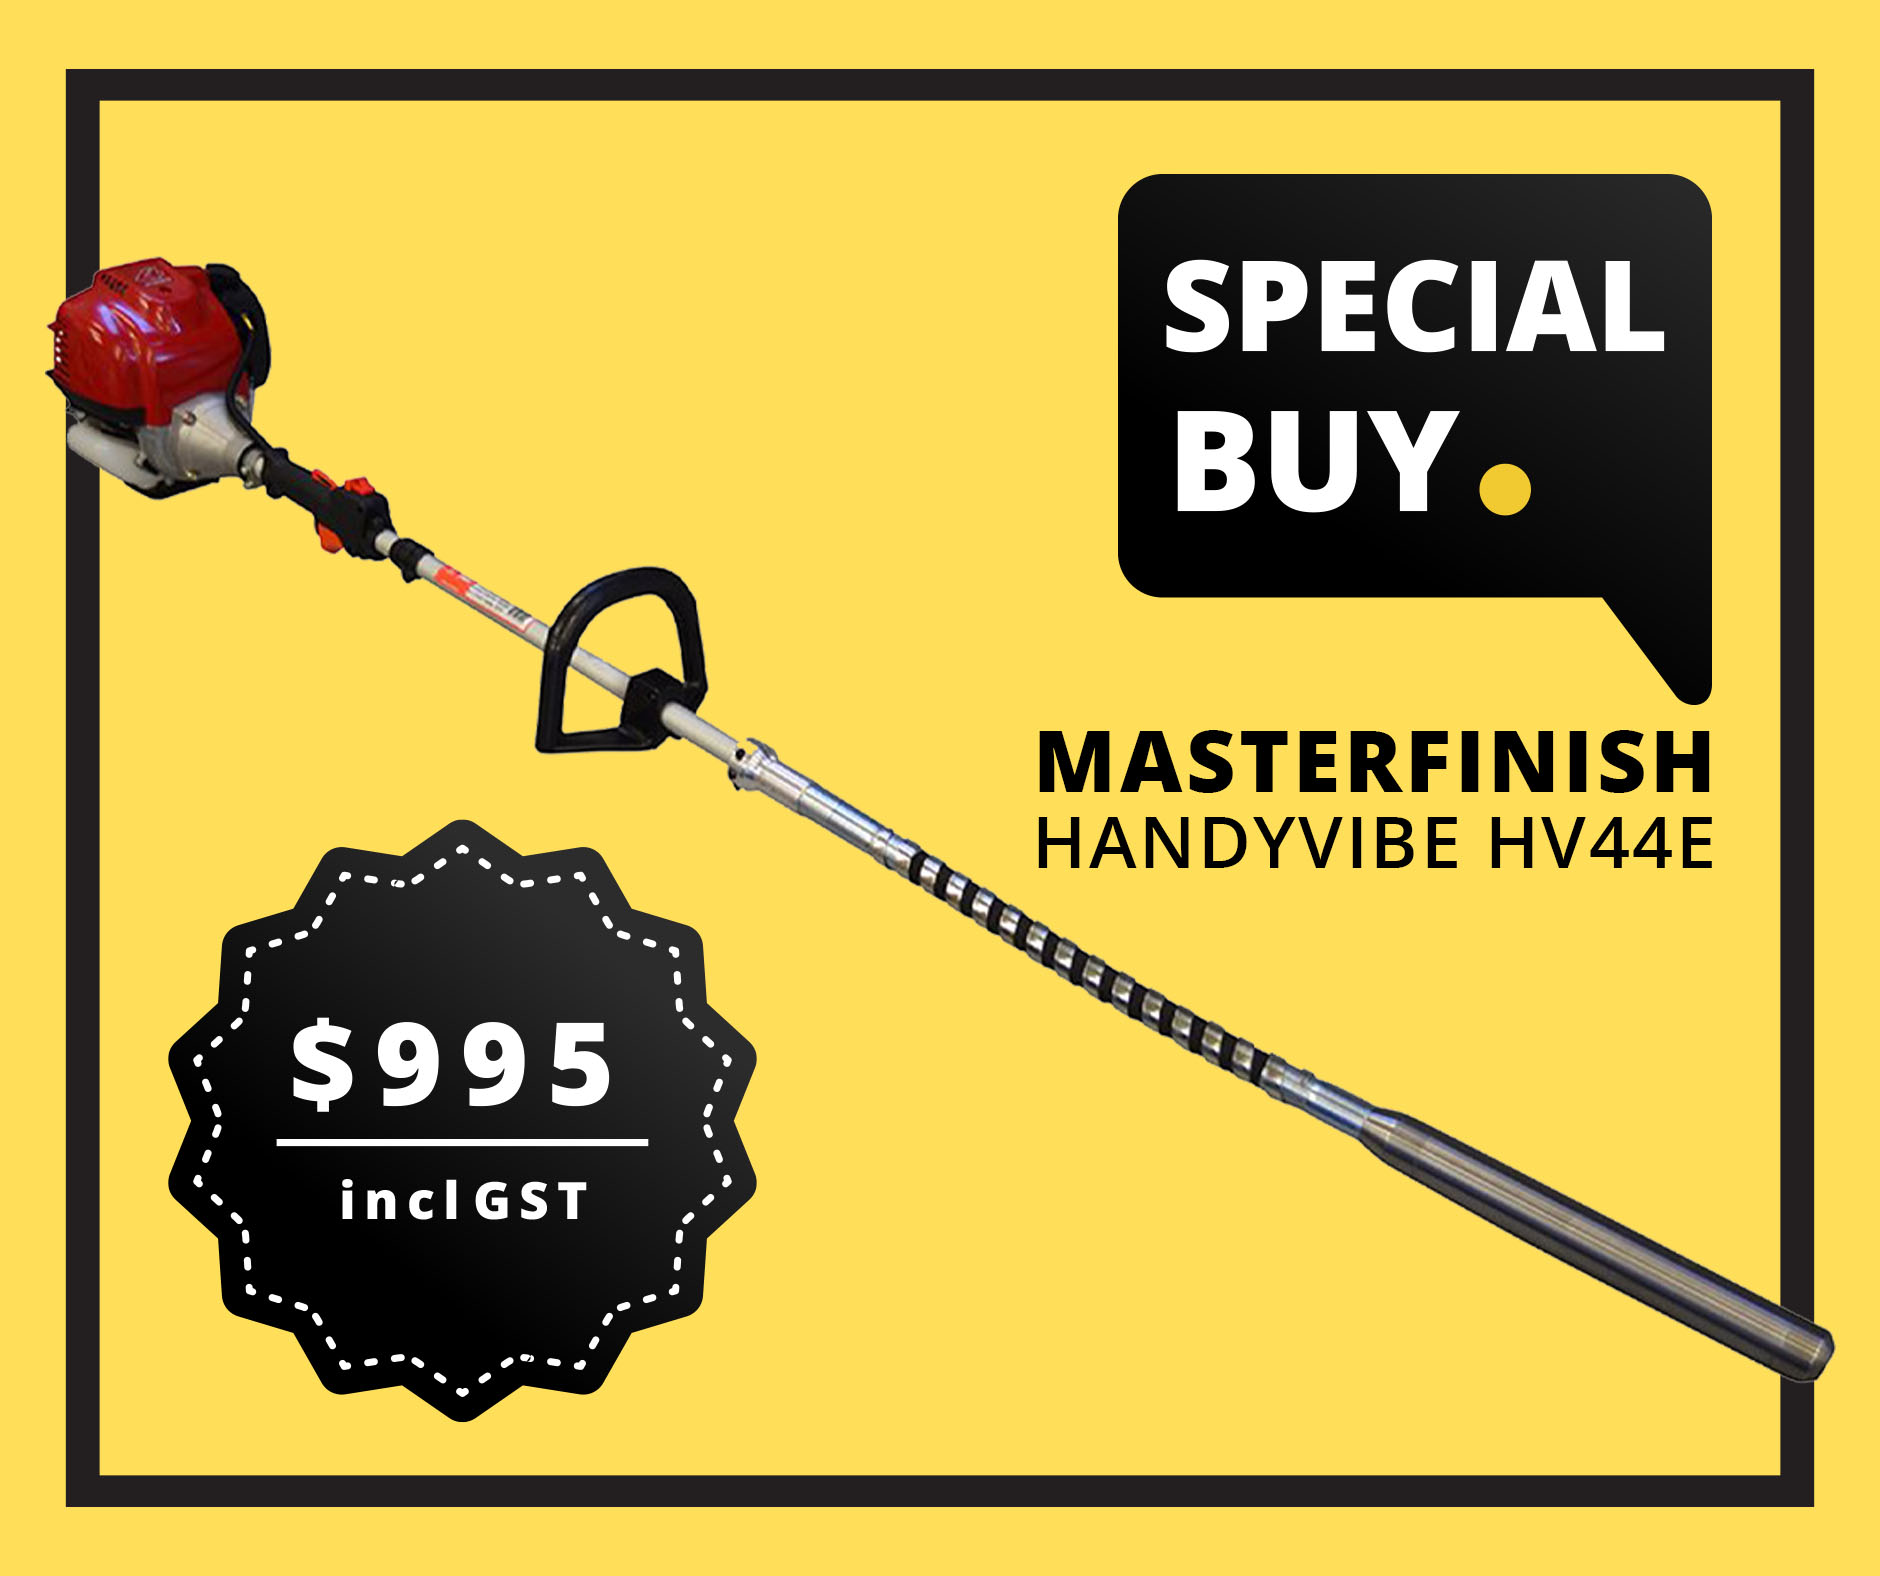 Special Buy Master Finish Handy Vibe HV44E